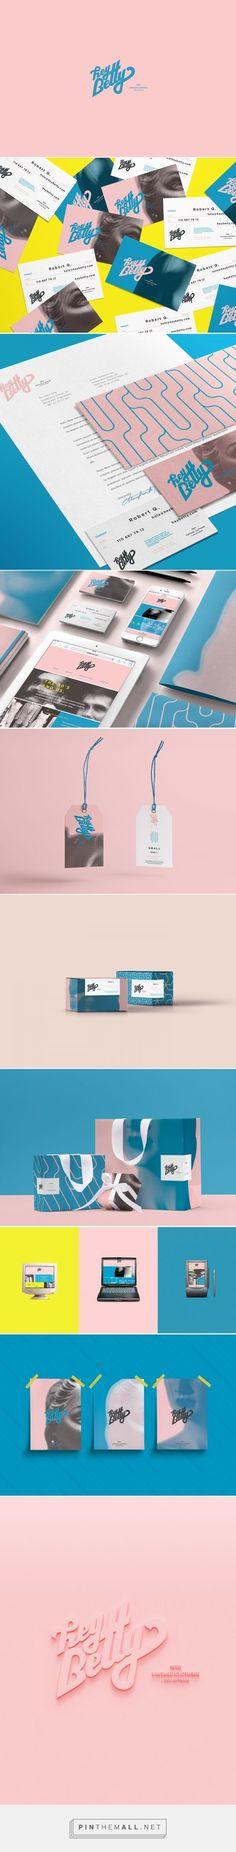 Hey Betty Vintage Clothing Branding by Sofia Villarreal | Fivestar Branding Agency – Design and Branding Agency & Inspiration Gallery